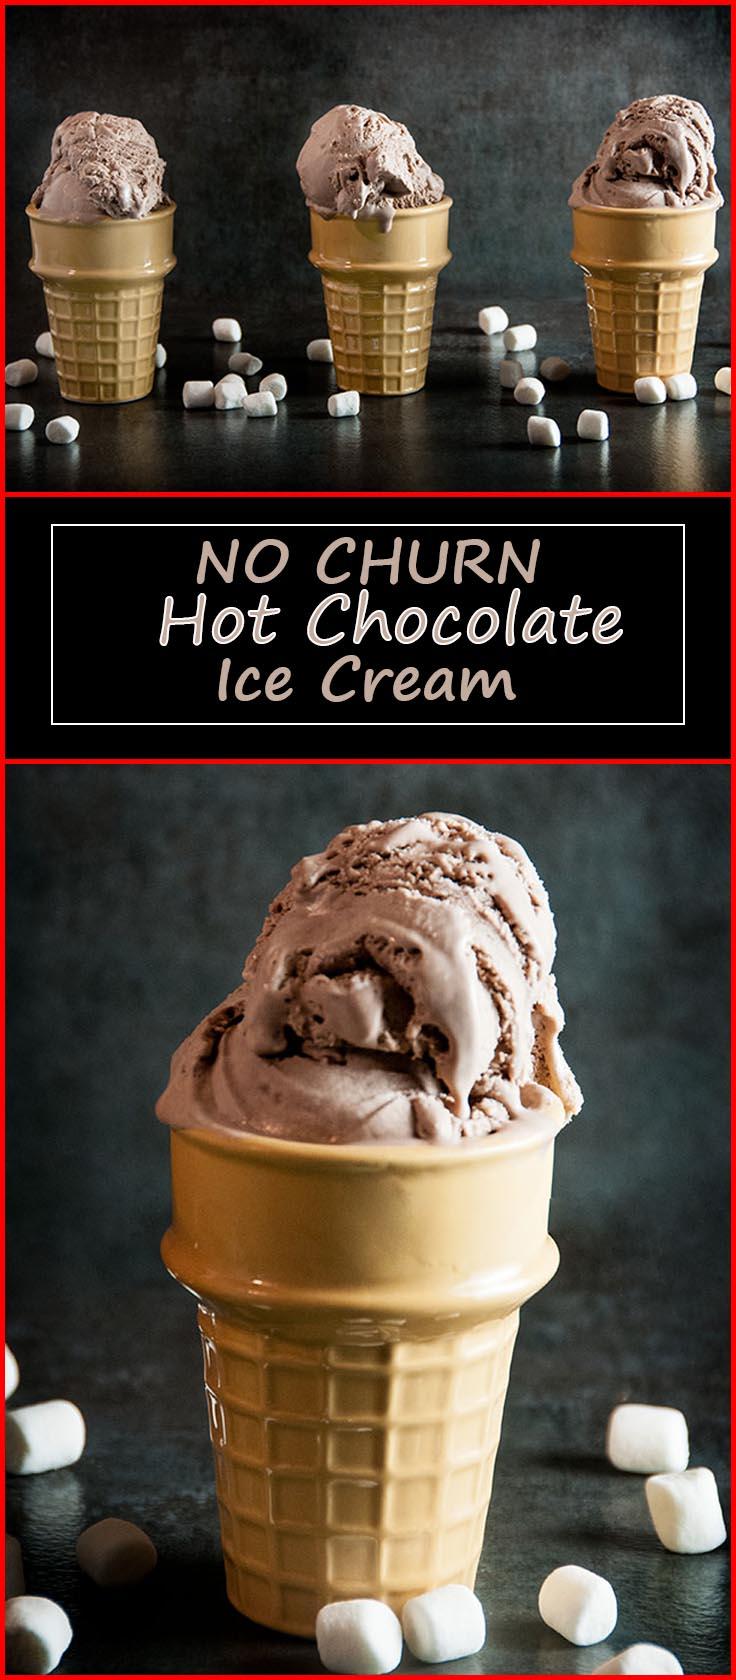 No Churn Hot Chocolate Ice Cream from www.SeasonedSprinkles.com